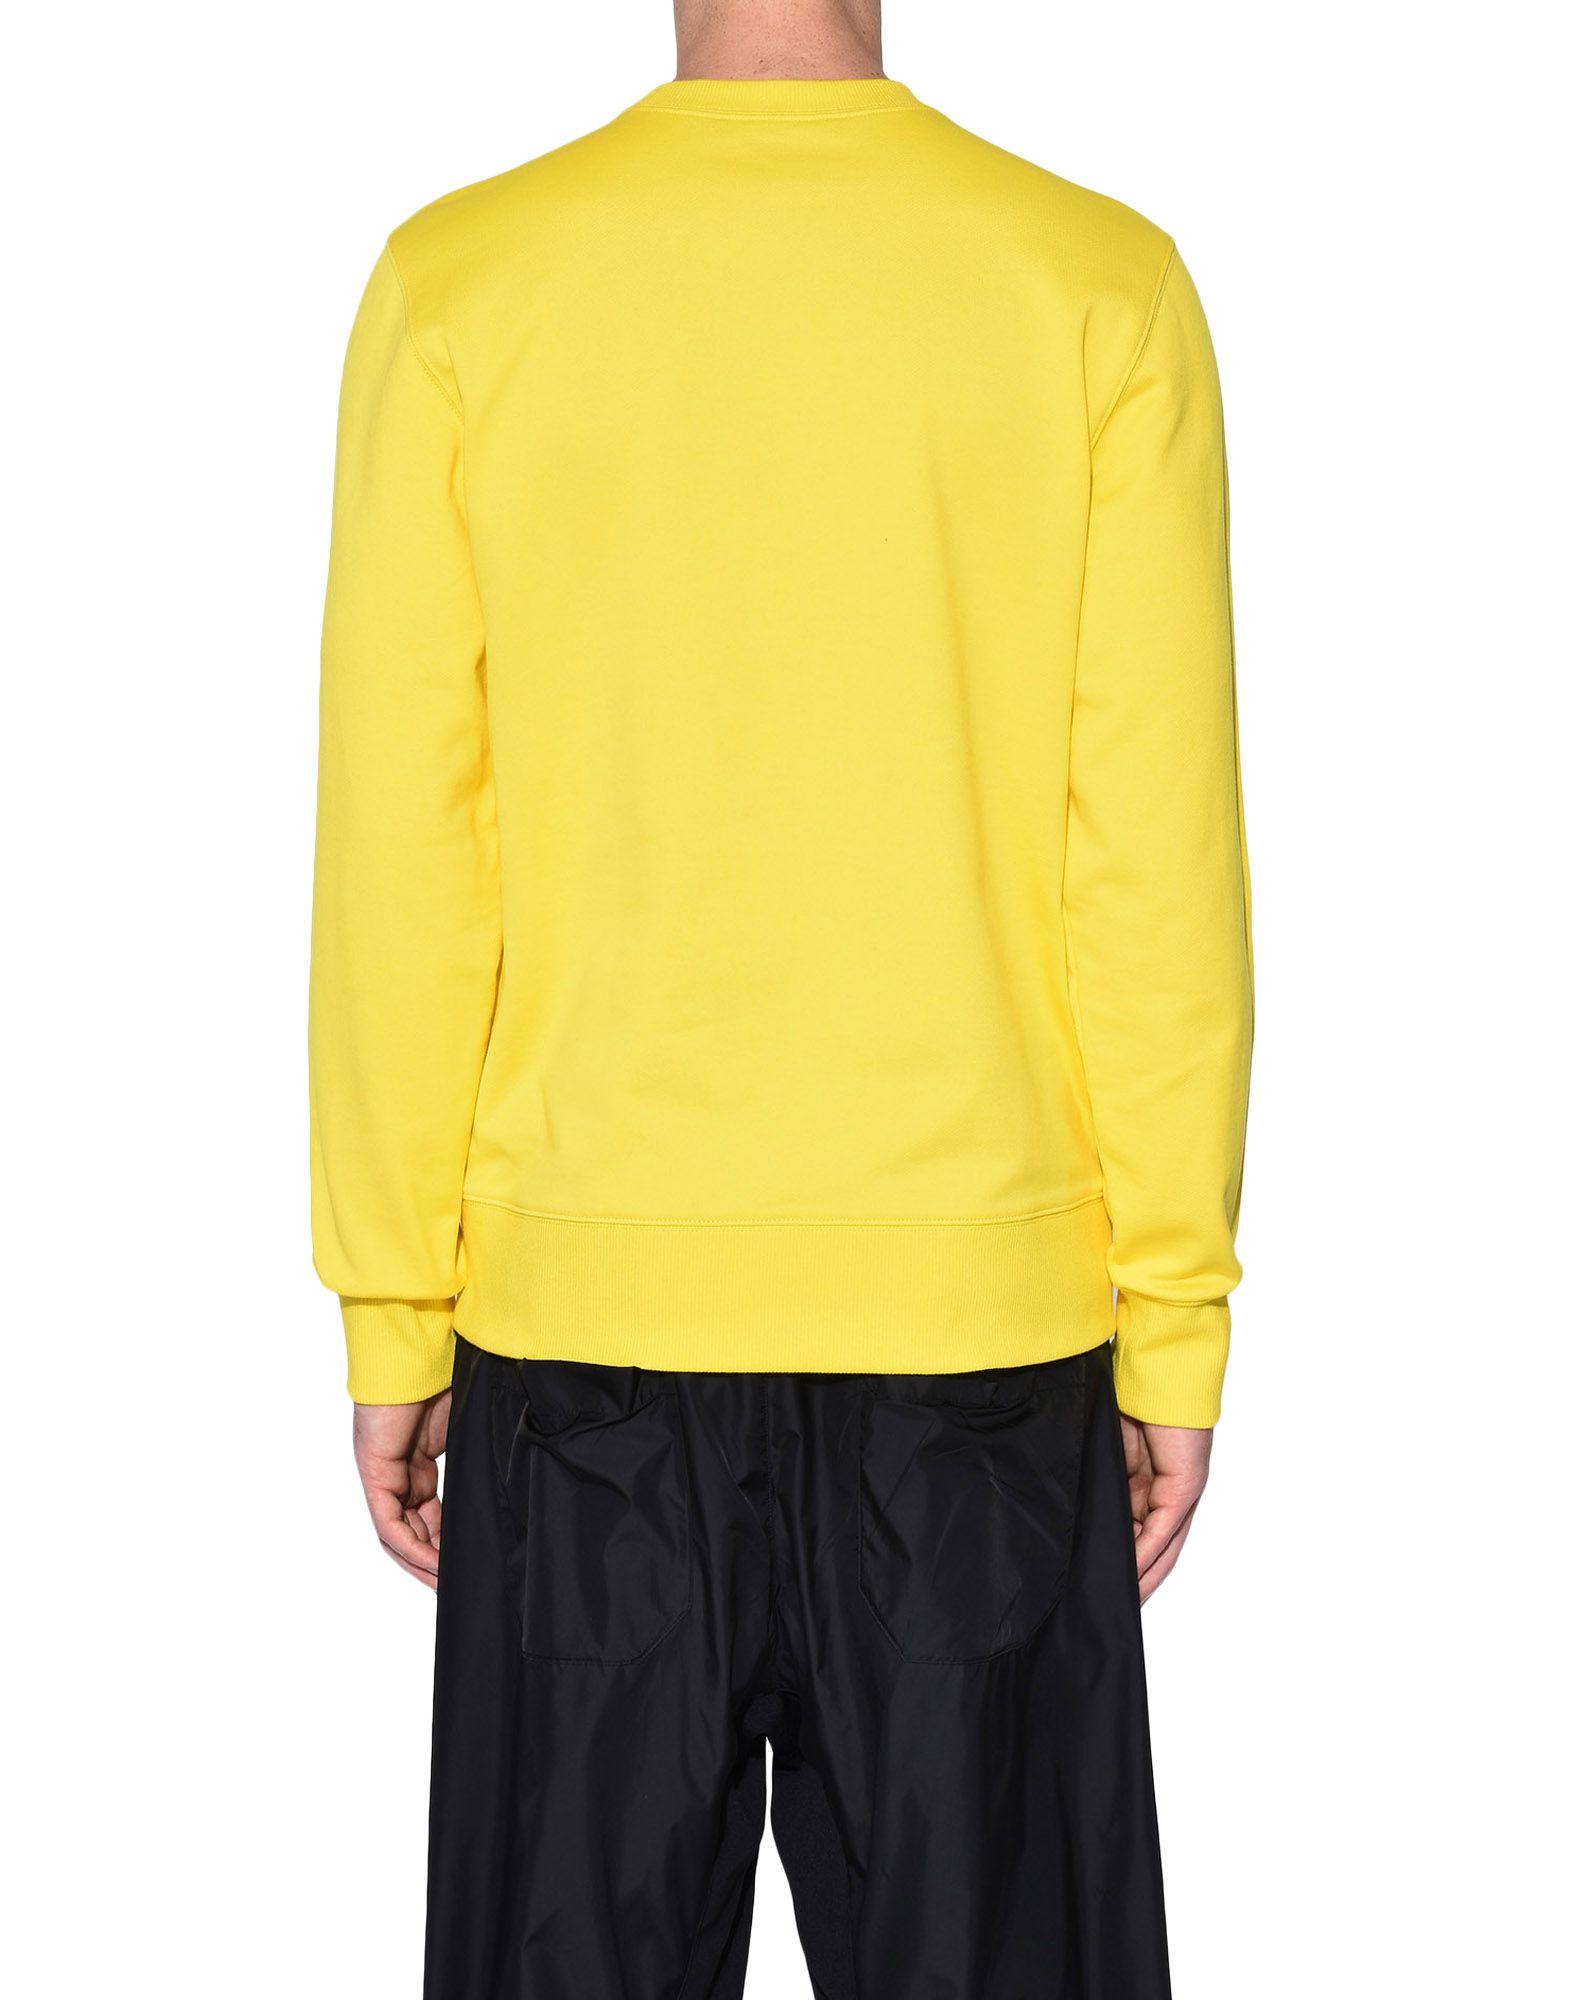 Y-3 Y-3 Classic Sweater スウェット メンズ d